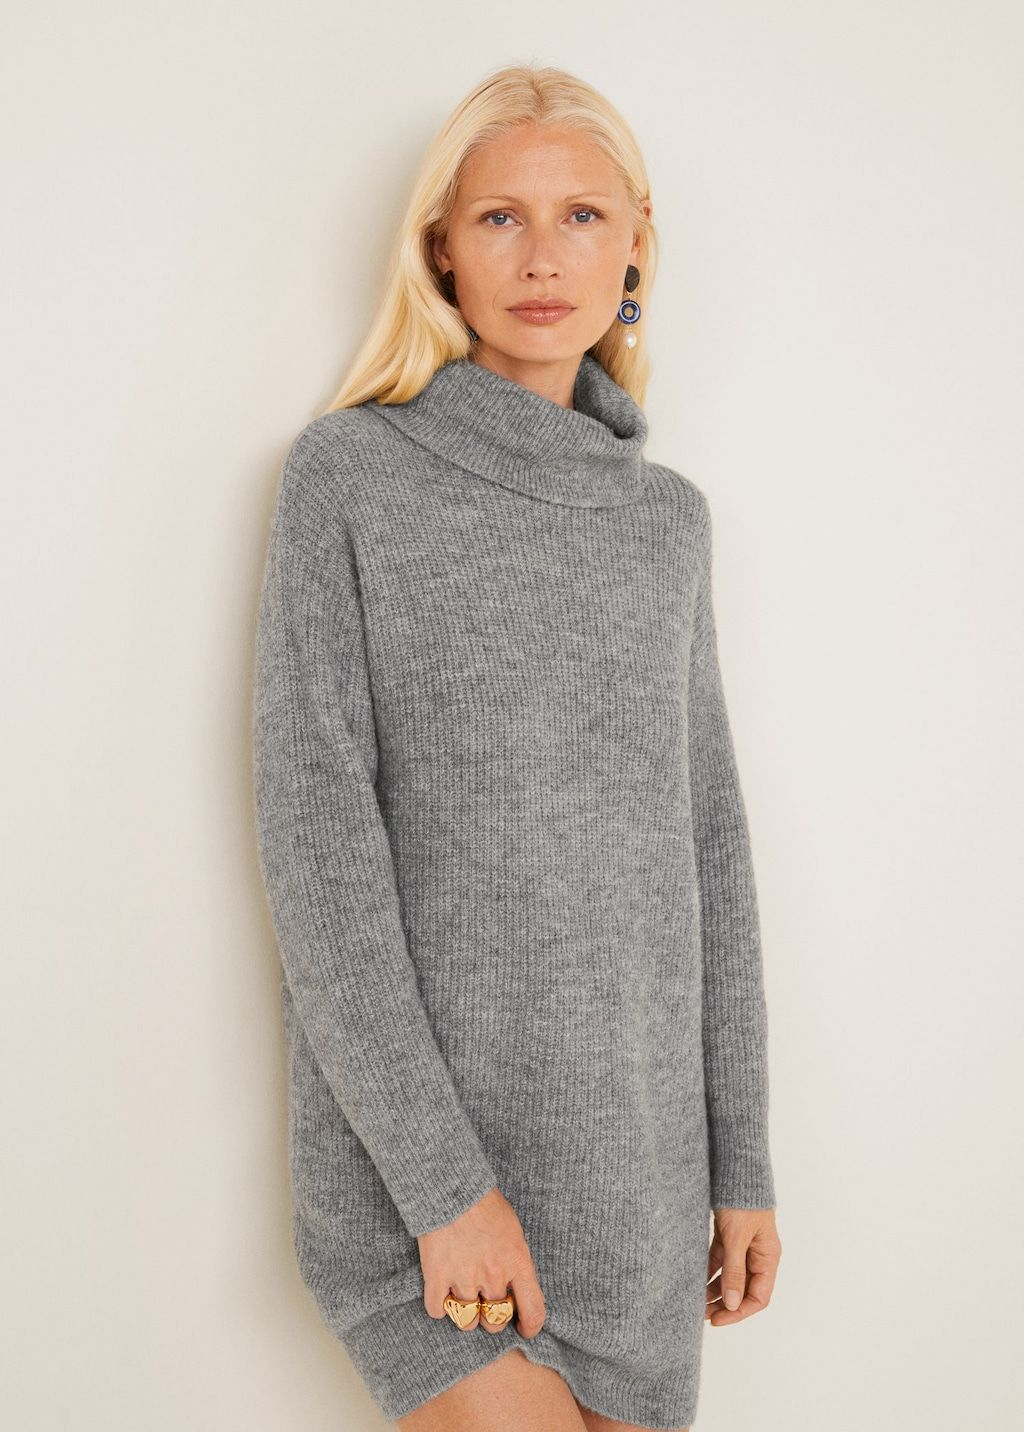 7e03b7626b61dc Tricot jurk ribdetails - Dames in 2018